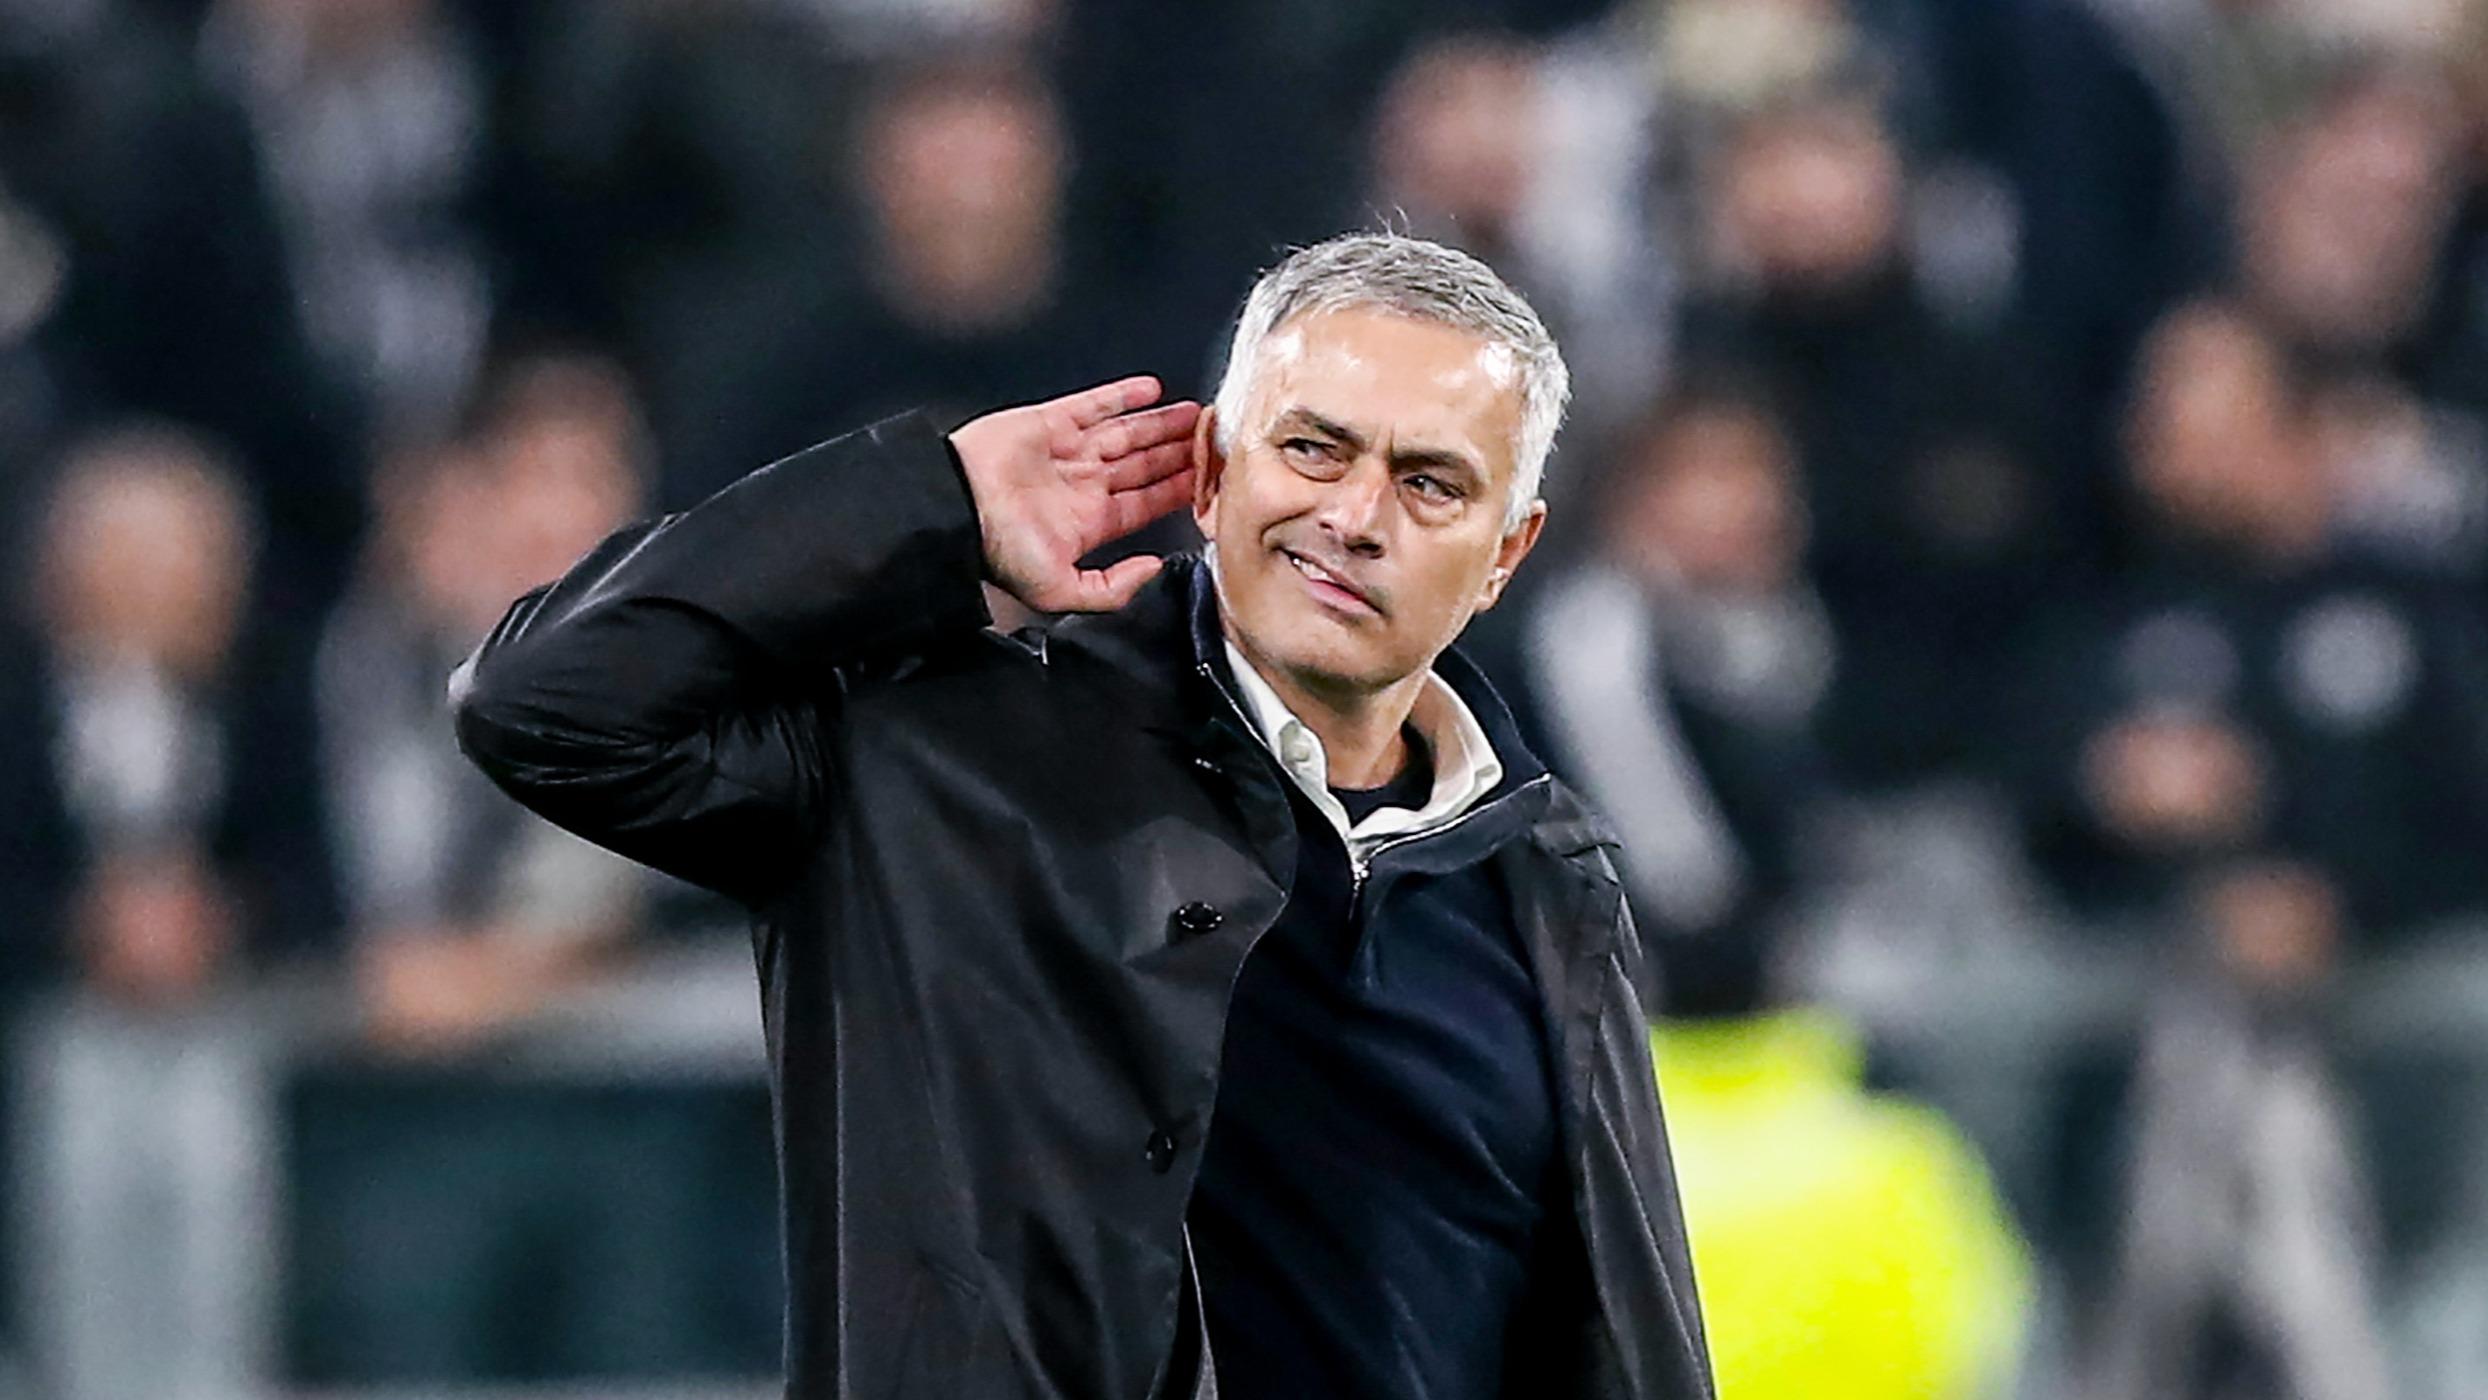 Jose Mourinho sacked by Tottenham Hotspurs